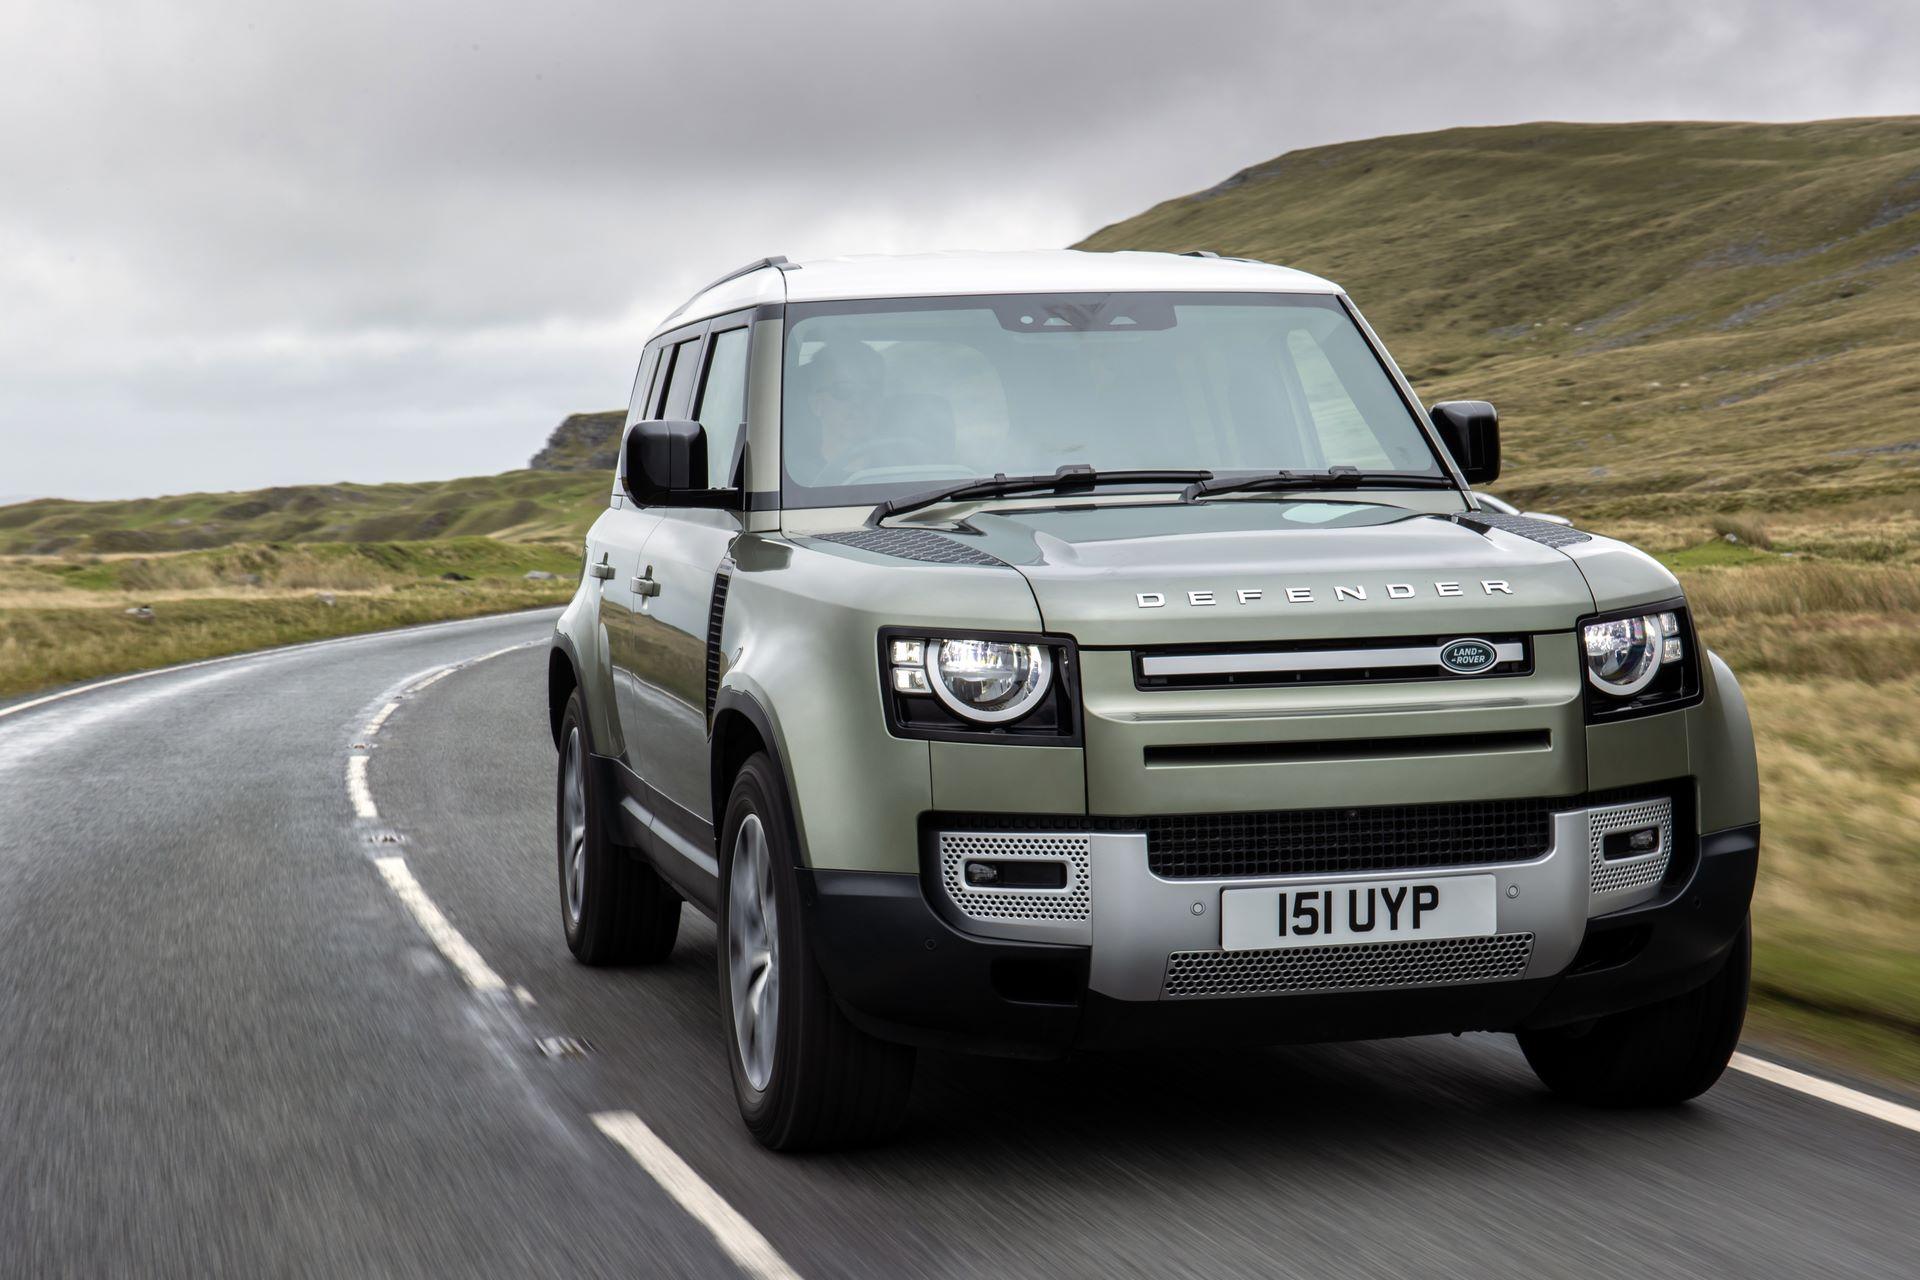 Land-Rover-Defender-Fuel-Cell-Hydrogen-concept-1